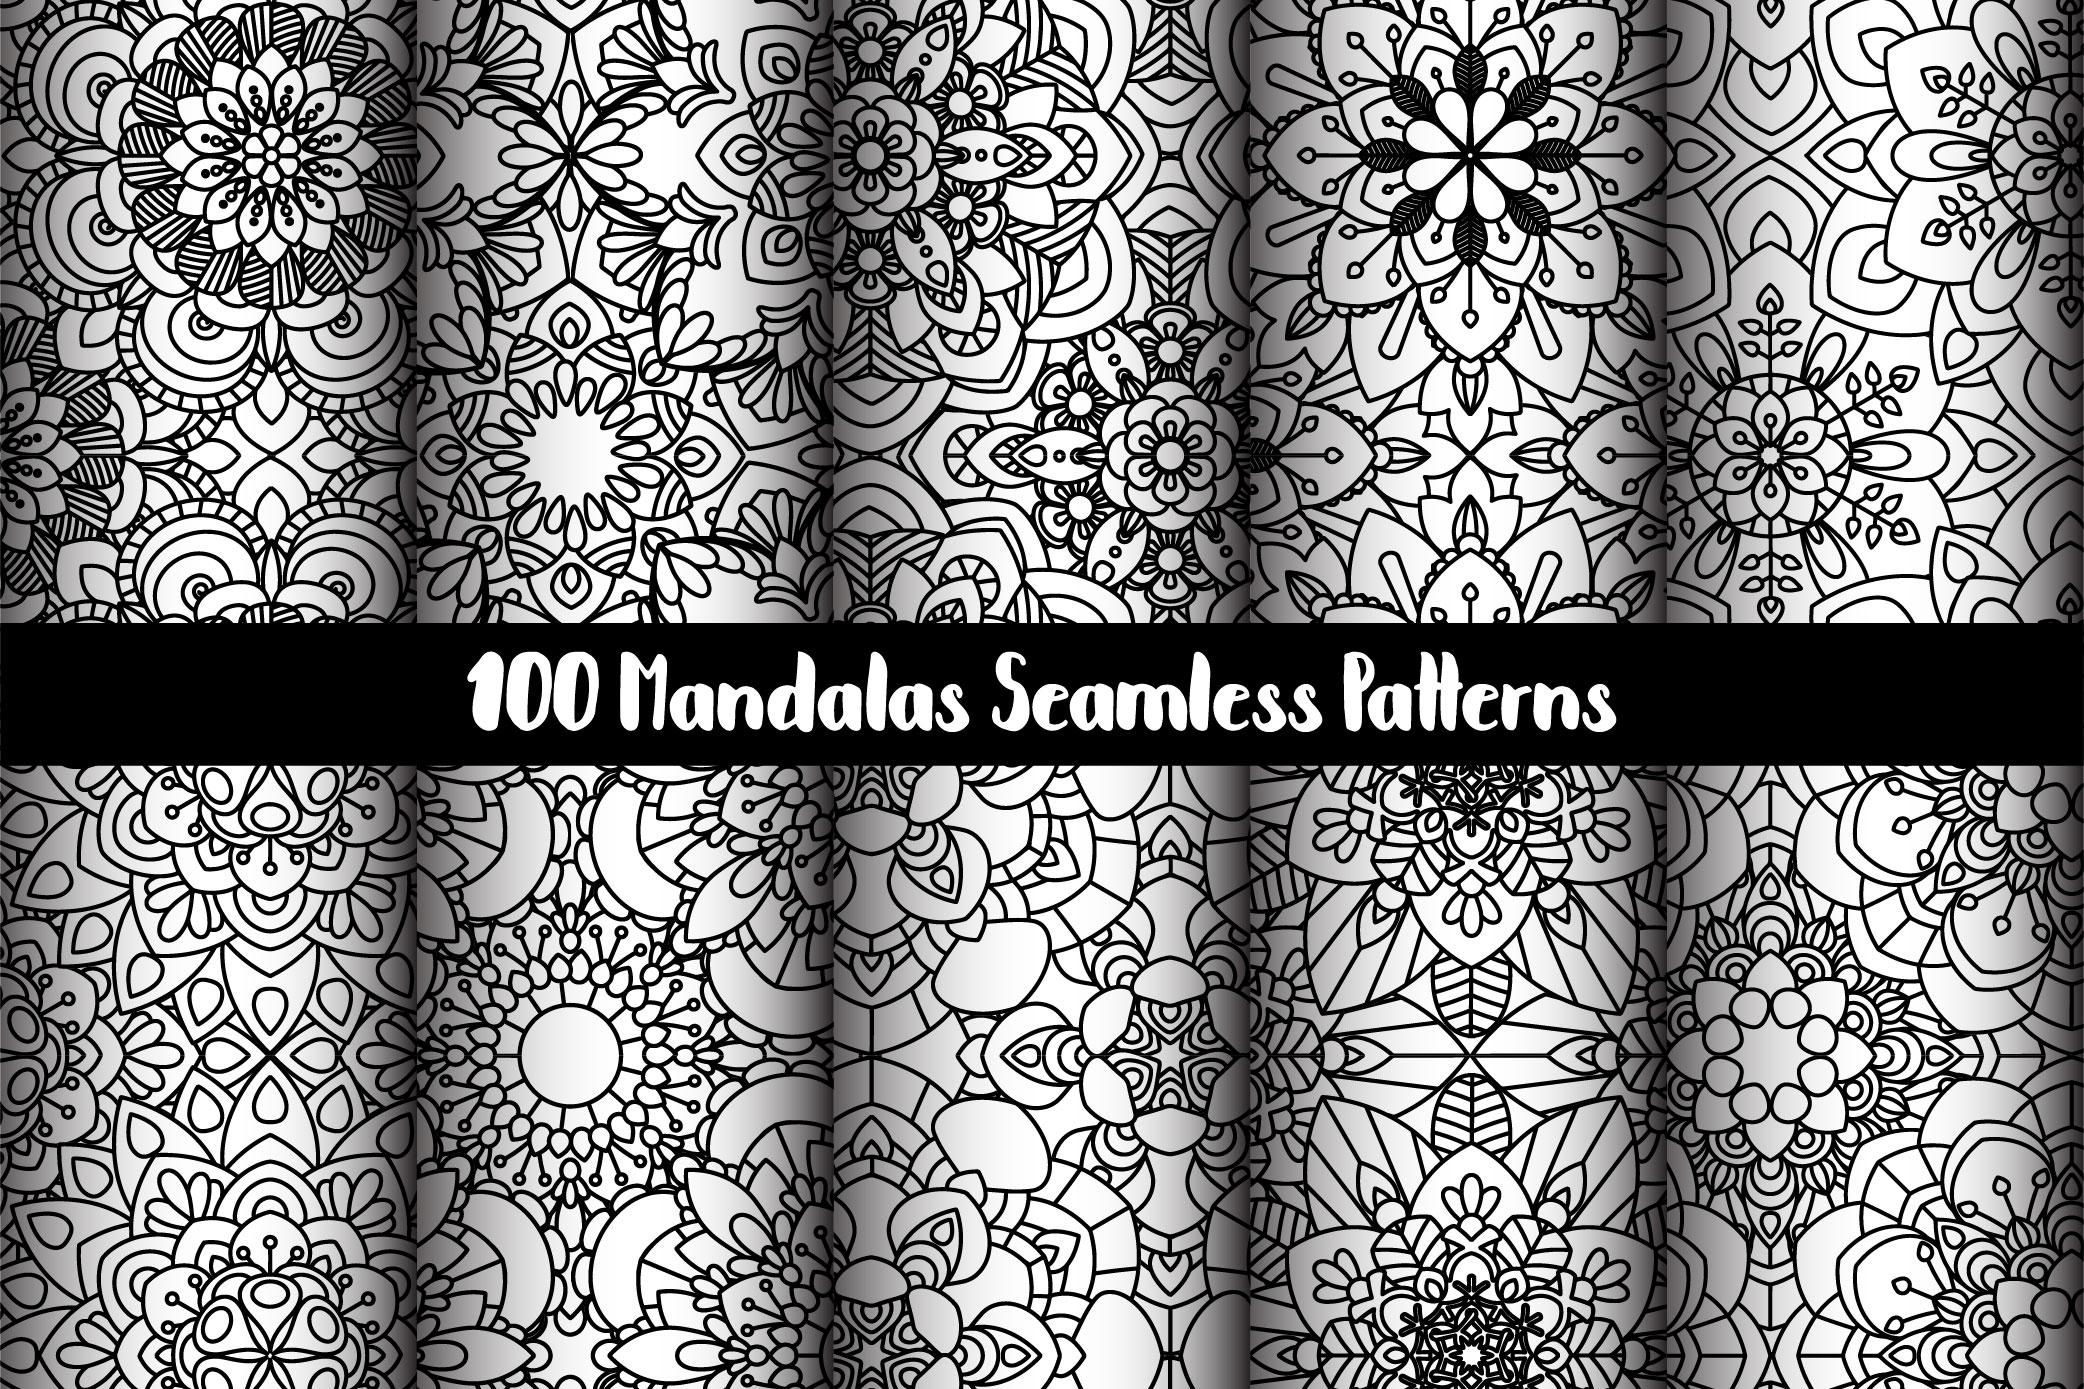 100 Mandalas Seamless Patterns example image 12